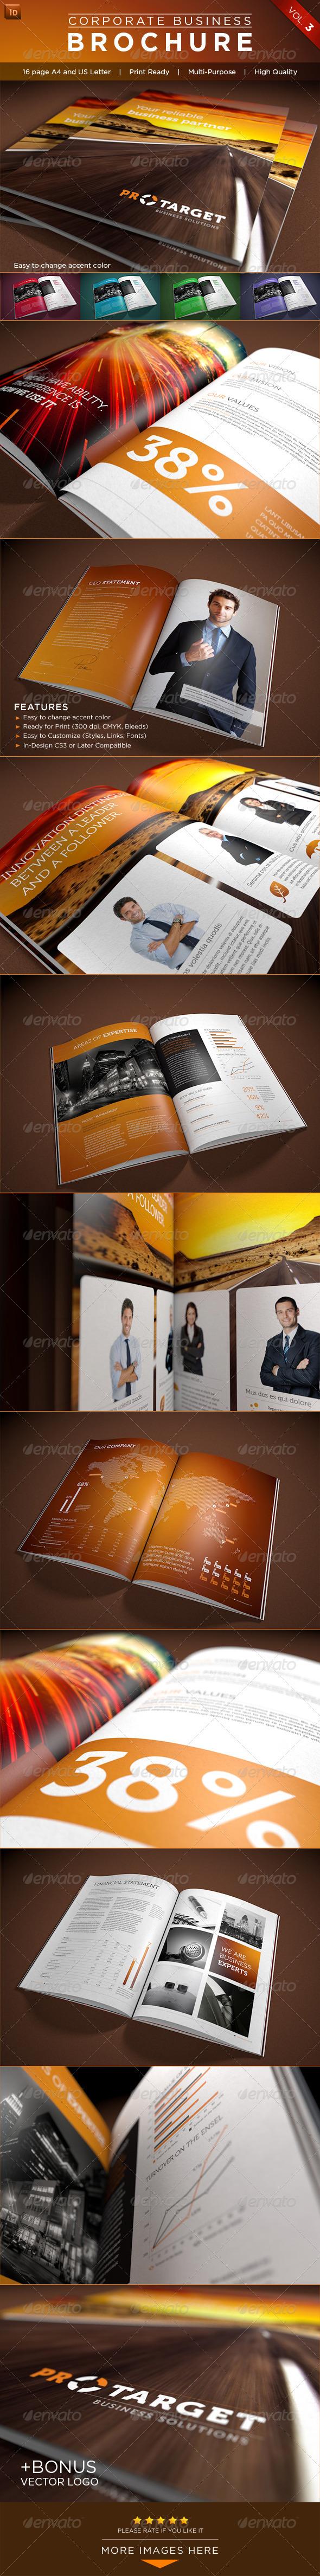 GraphicRiver Corporate Business Brochure Vol 3 2605051